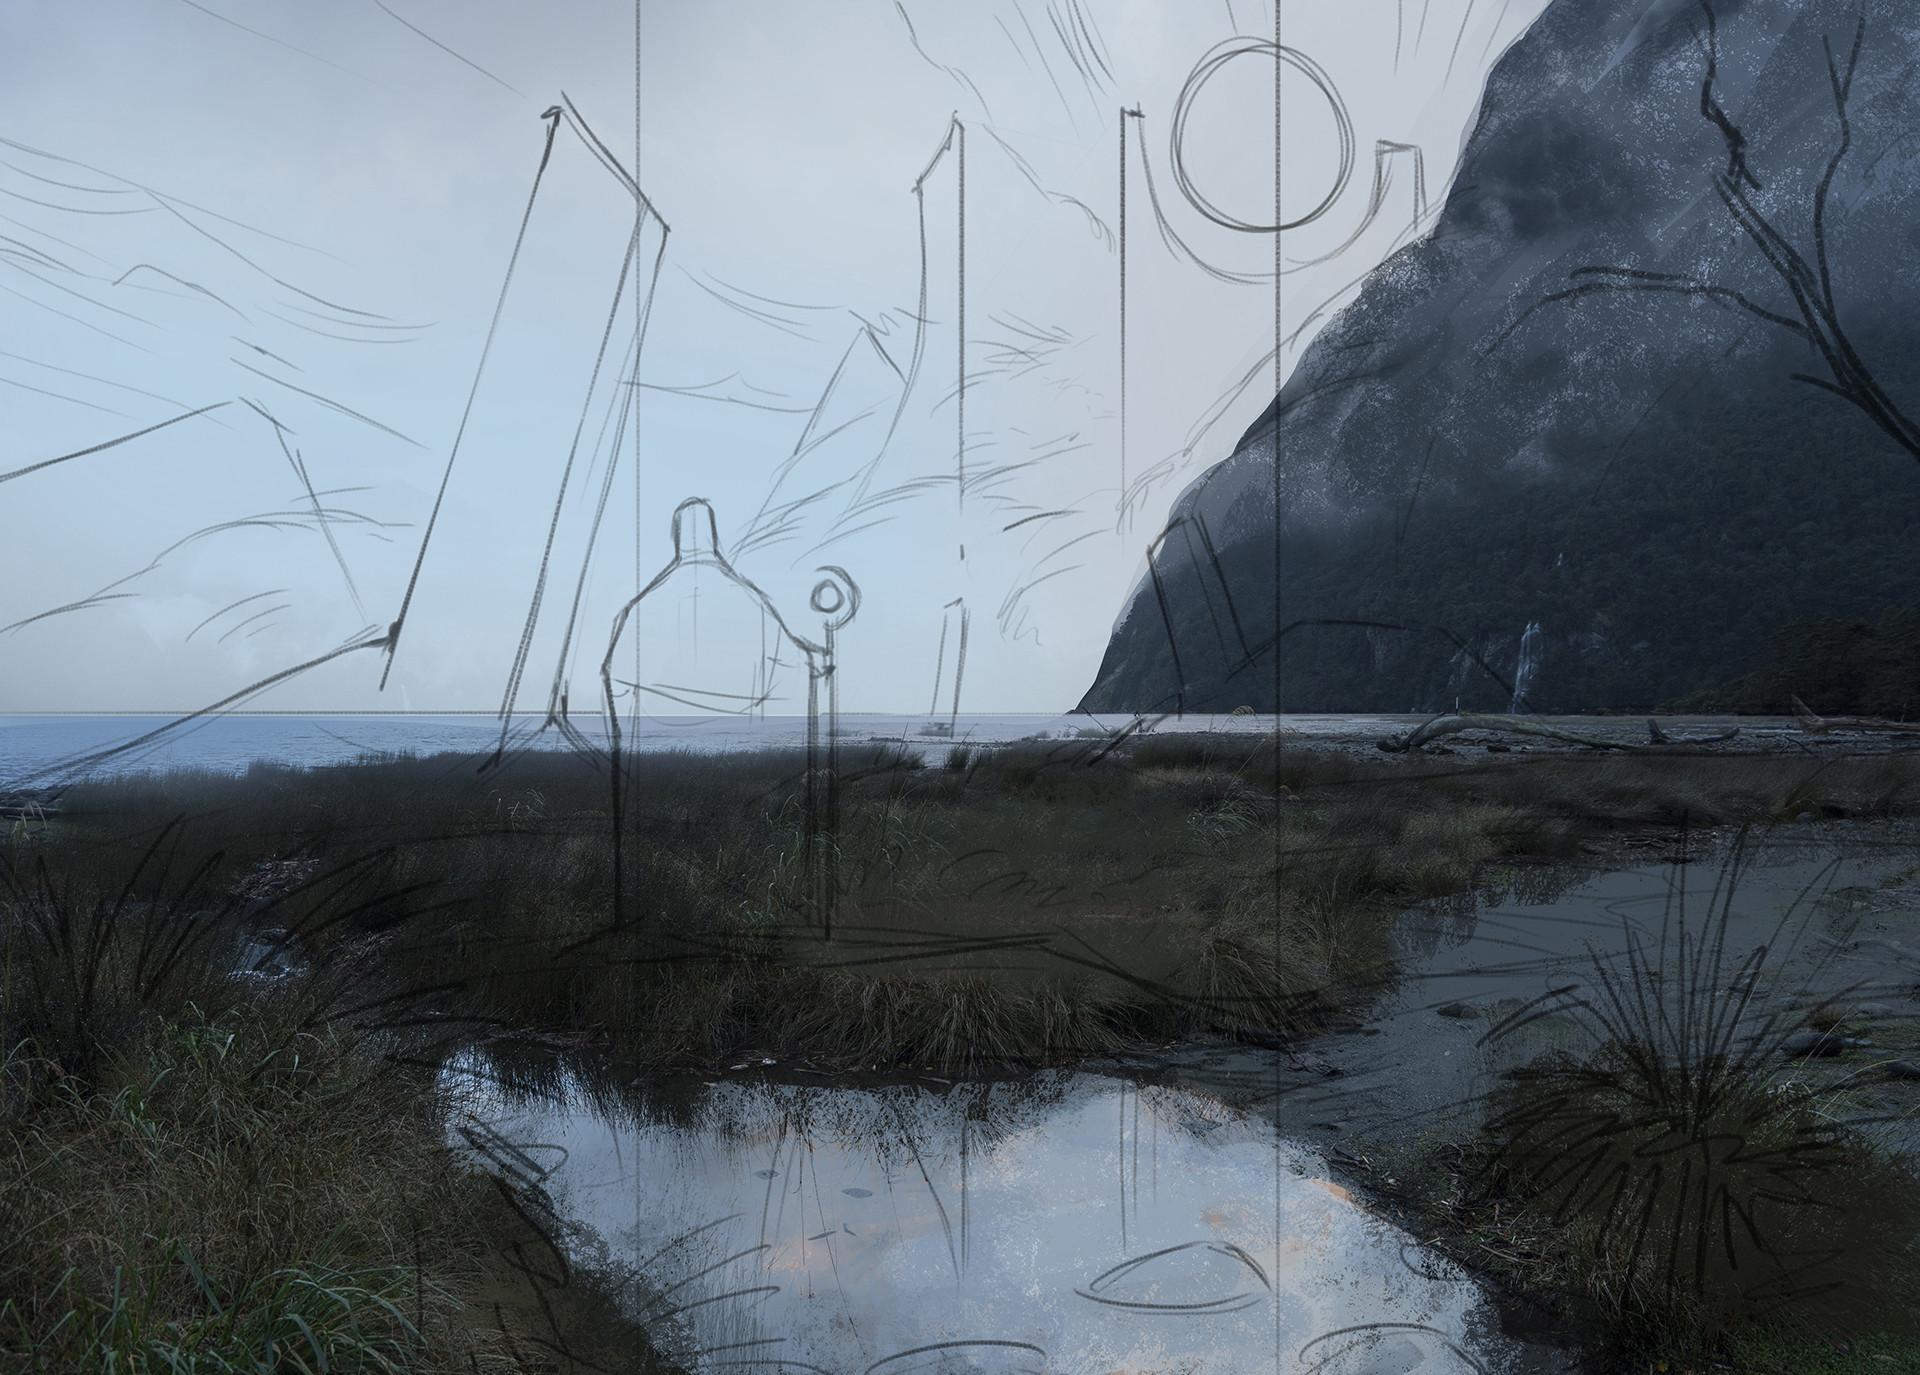 David alvarez dalvarez pilgrimage 02